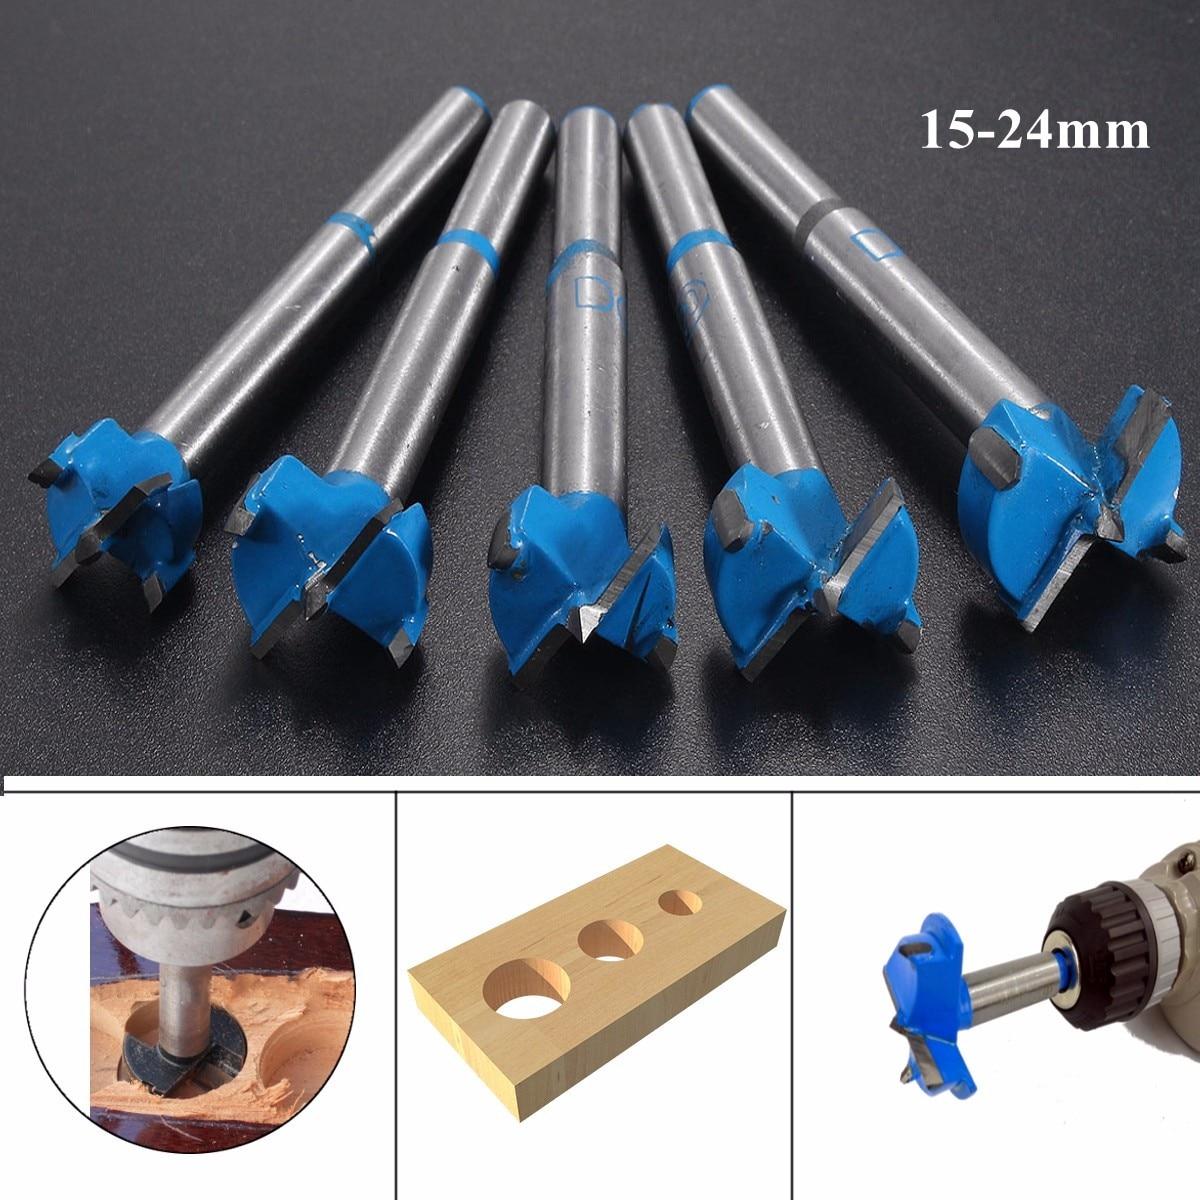 15-24mm Wood Hinge Boring Hole Saw Drill Bit Carbide Cutter Auger Drill Bit